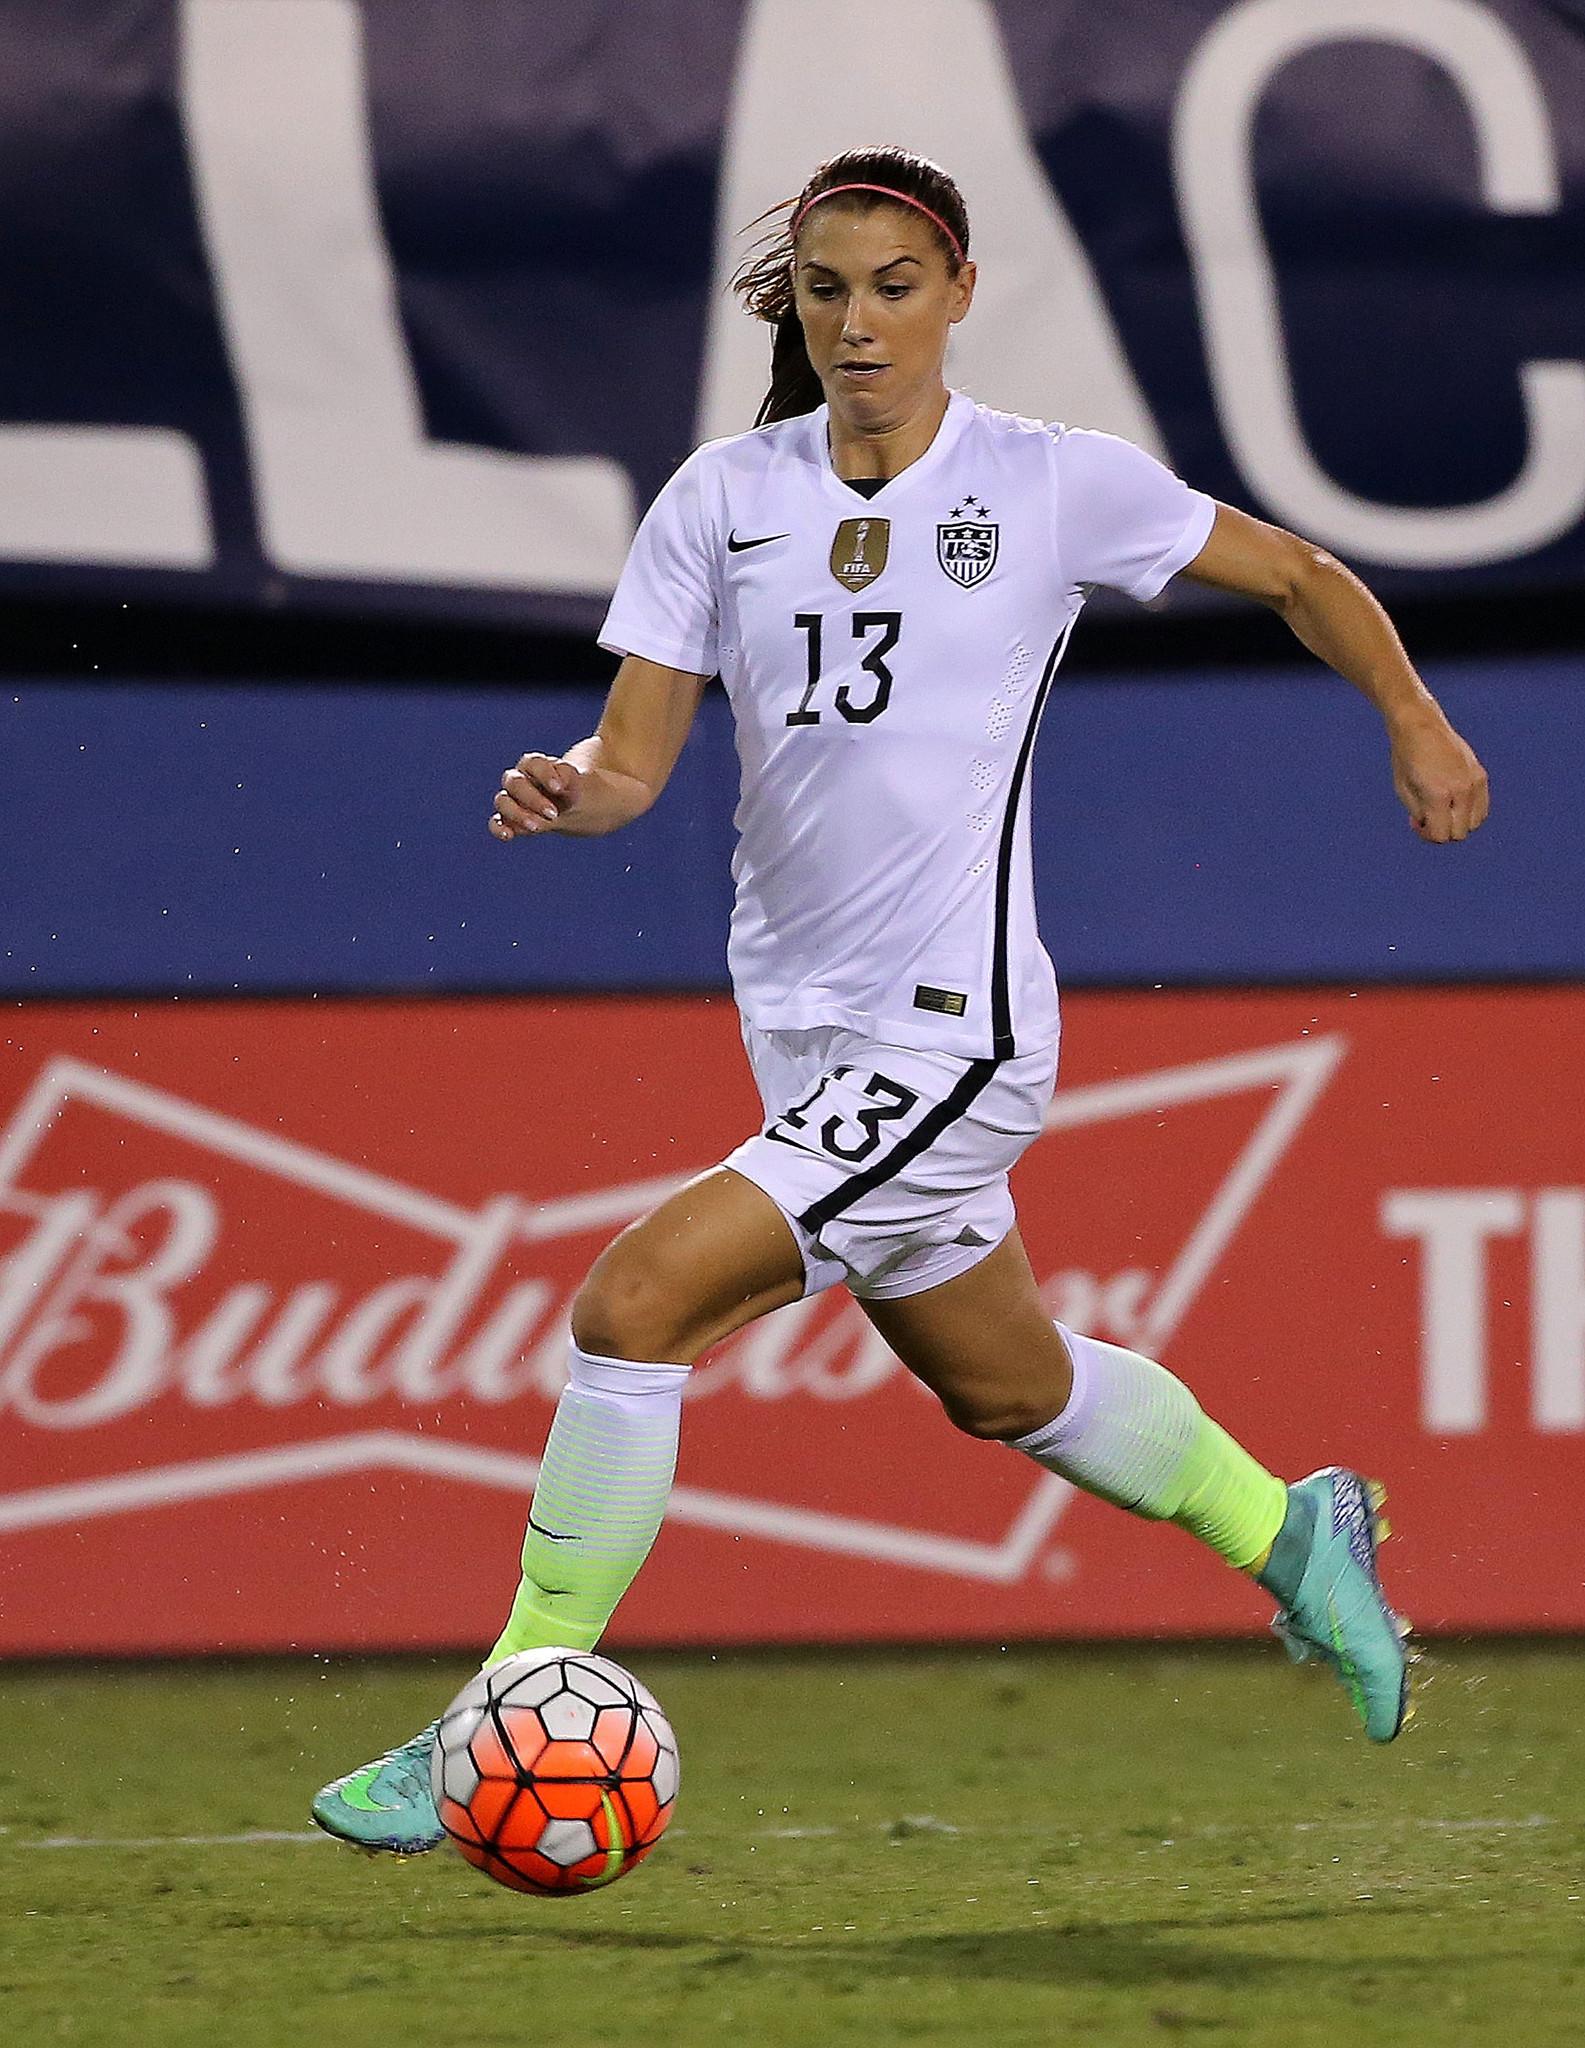 Matt Lauer Rio >> U.S. women's soccer players could boycott Olympics over pay dispute - Chicago Tribune